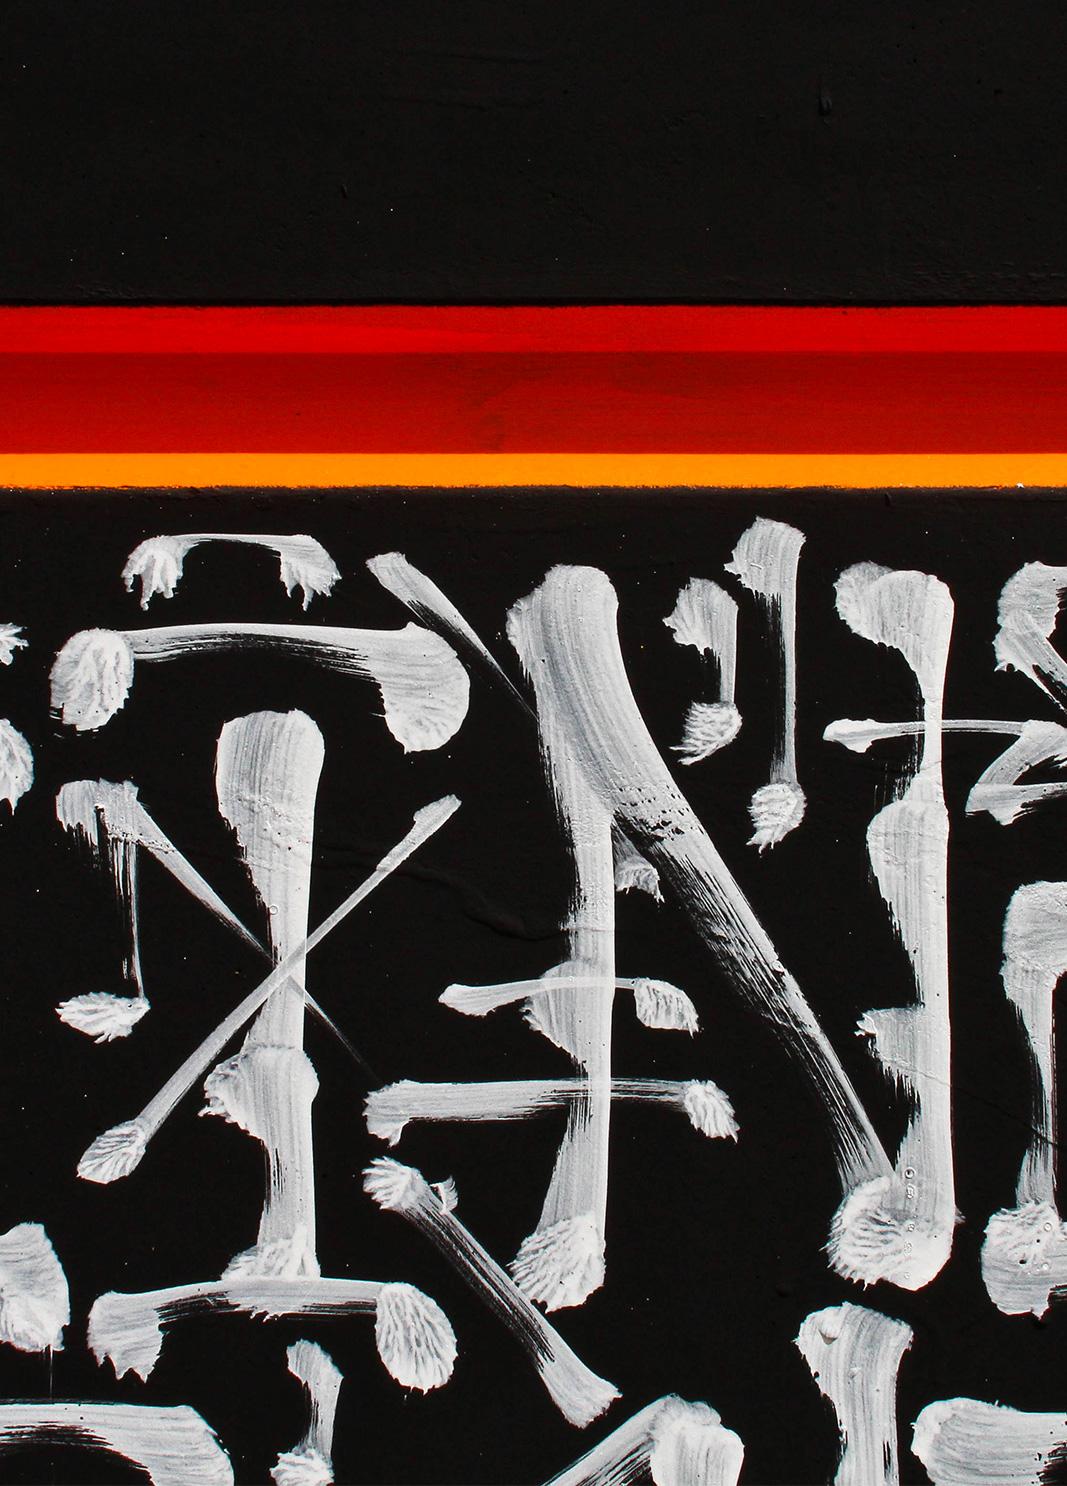 Lek-Sowat-DMV-da-mental-vaporz-graffiti-soldart-montana-bombe-spray-evry-paris-mur-peinture-nicolas-gzeley-4